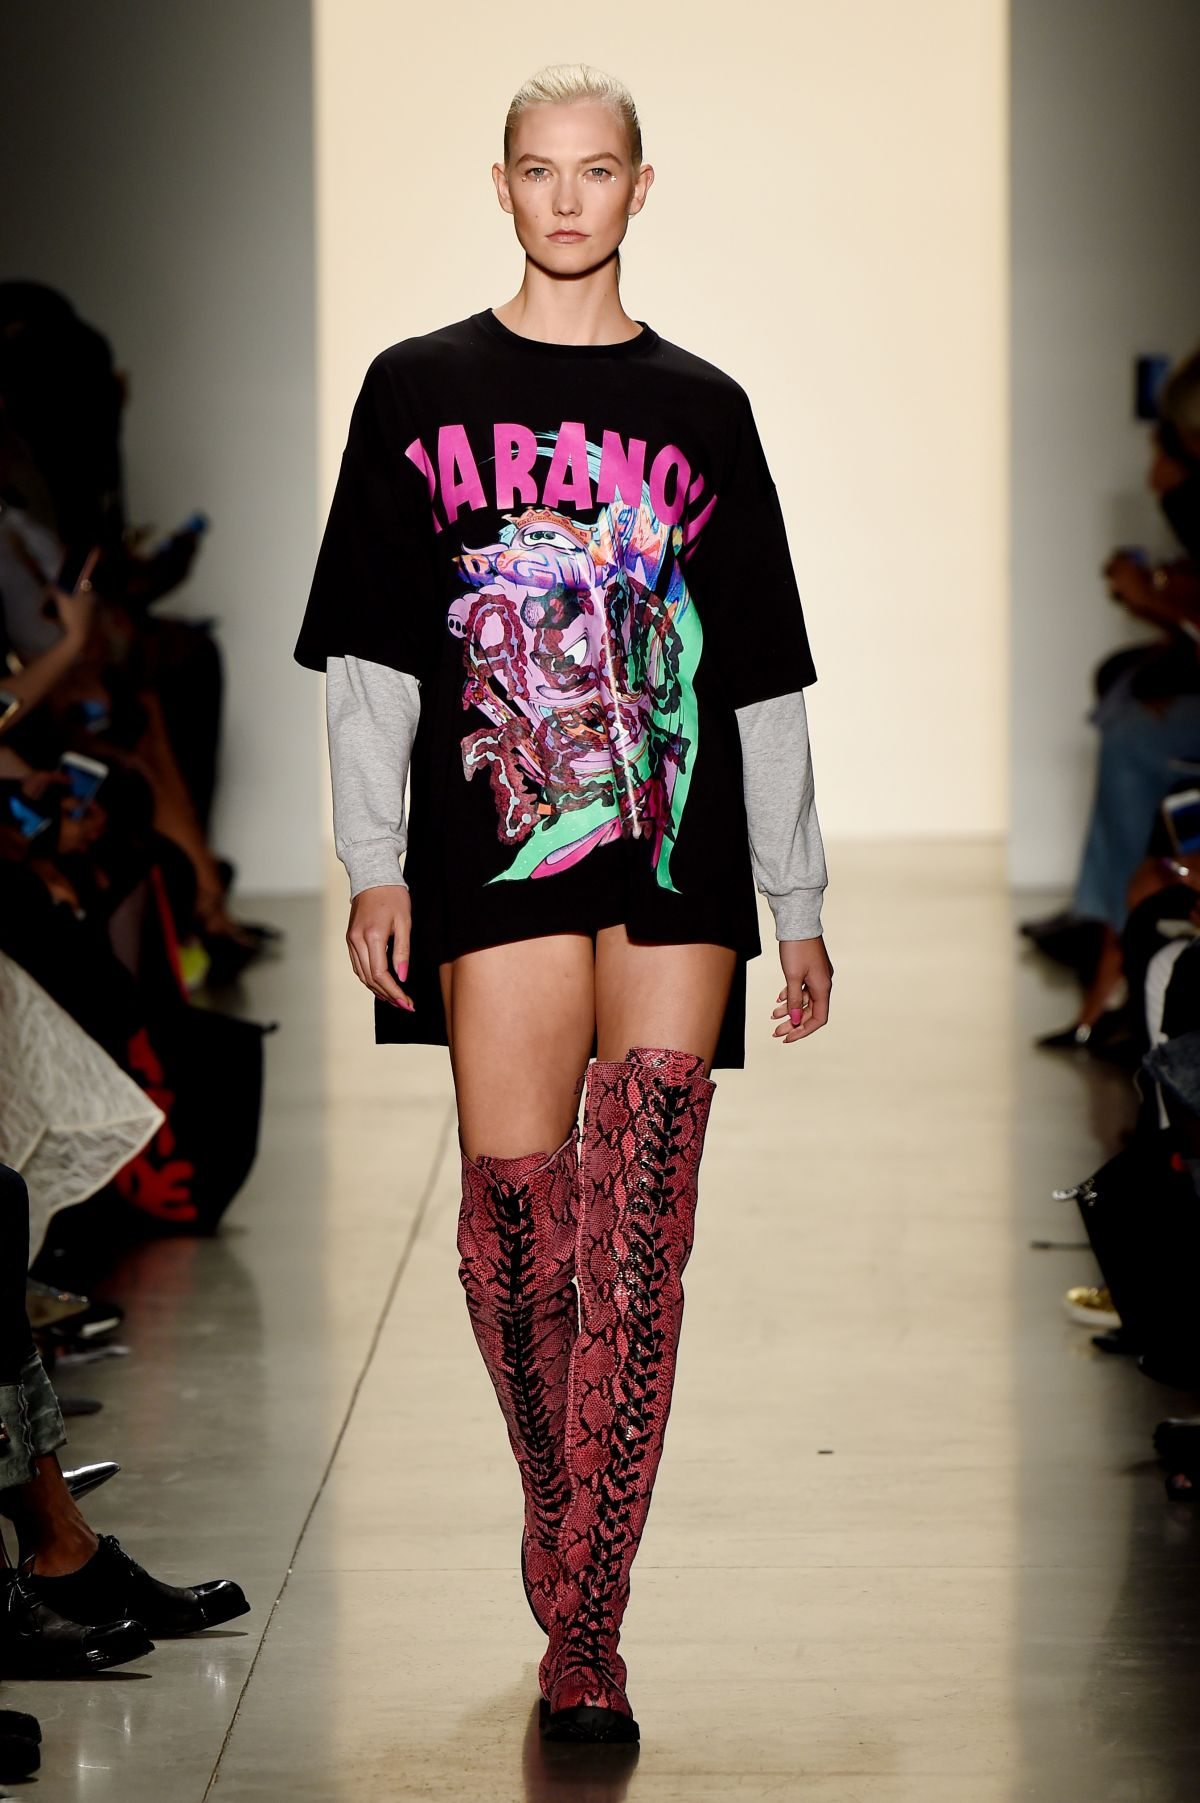 KARLIE KLOSS at Jeremy Scott Fashion Show in New York 09/08/2017